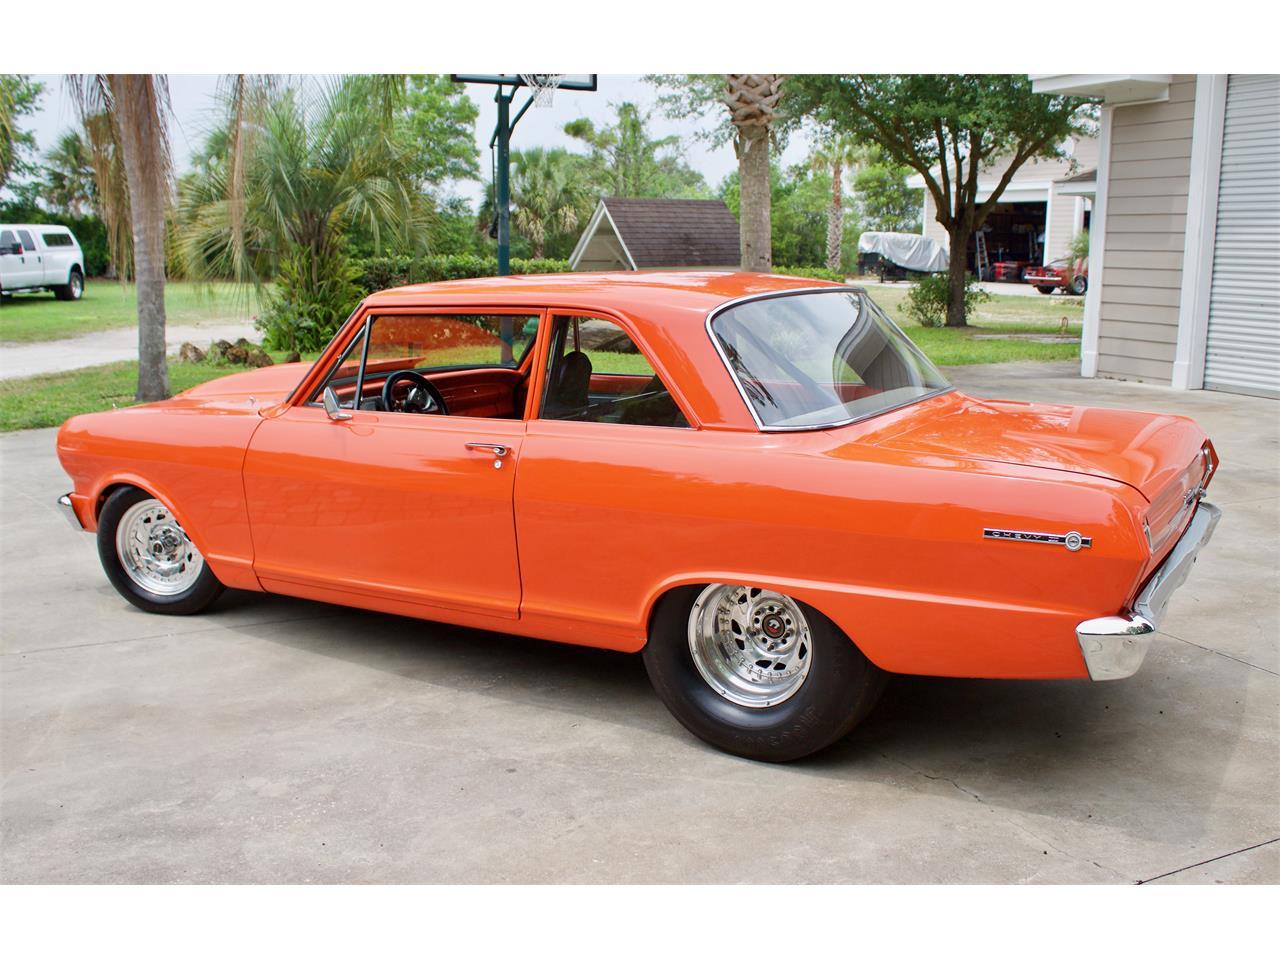 1964 Chevrolet Nova (CC-1341503) for sale in Eustis, Florida